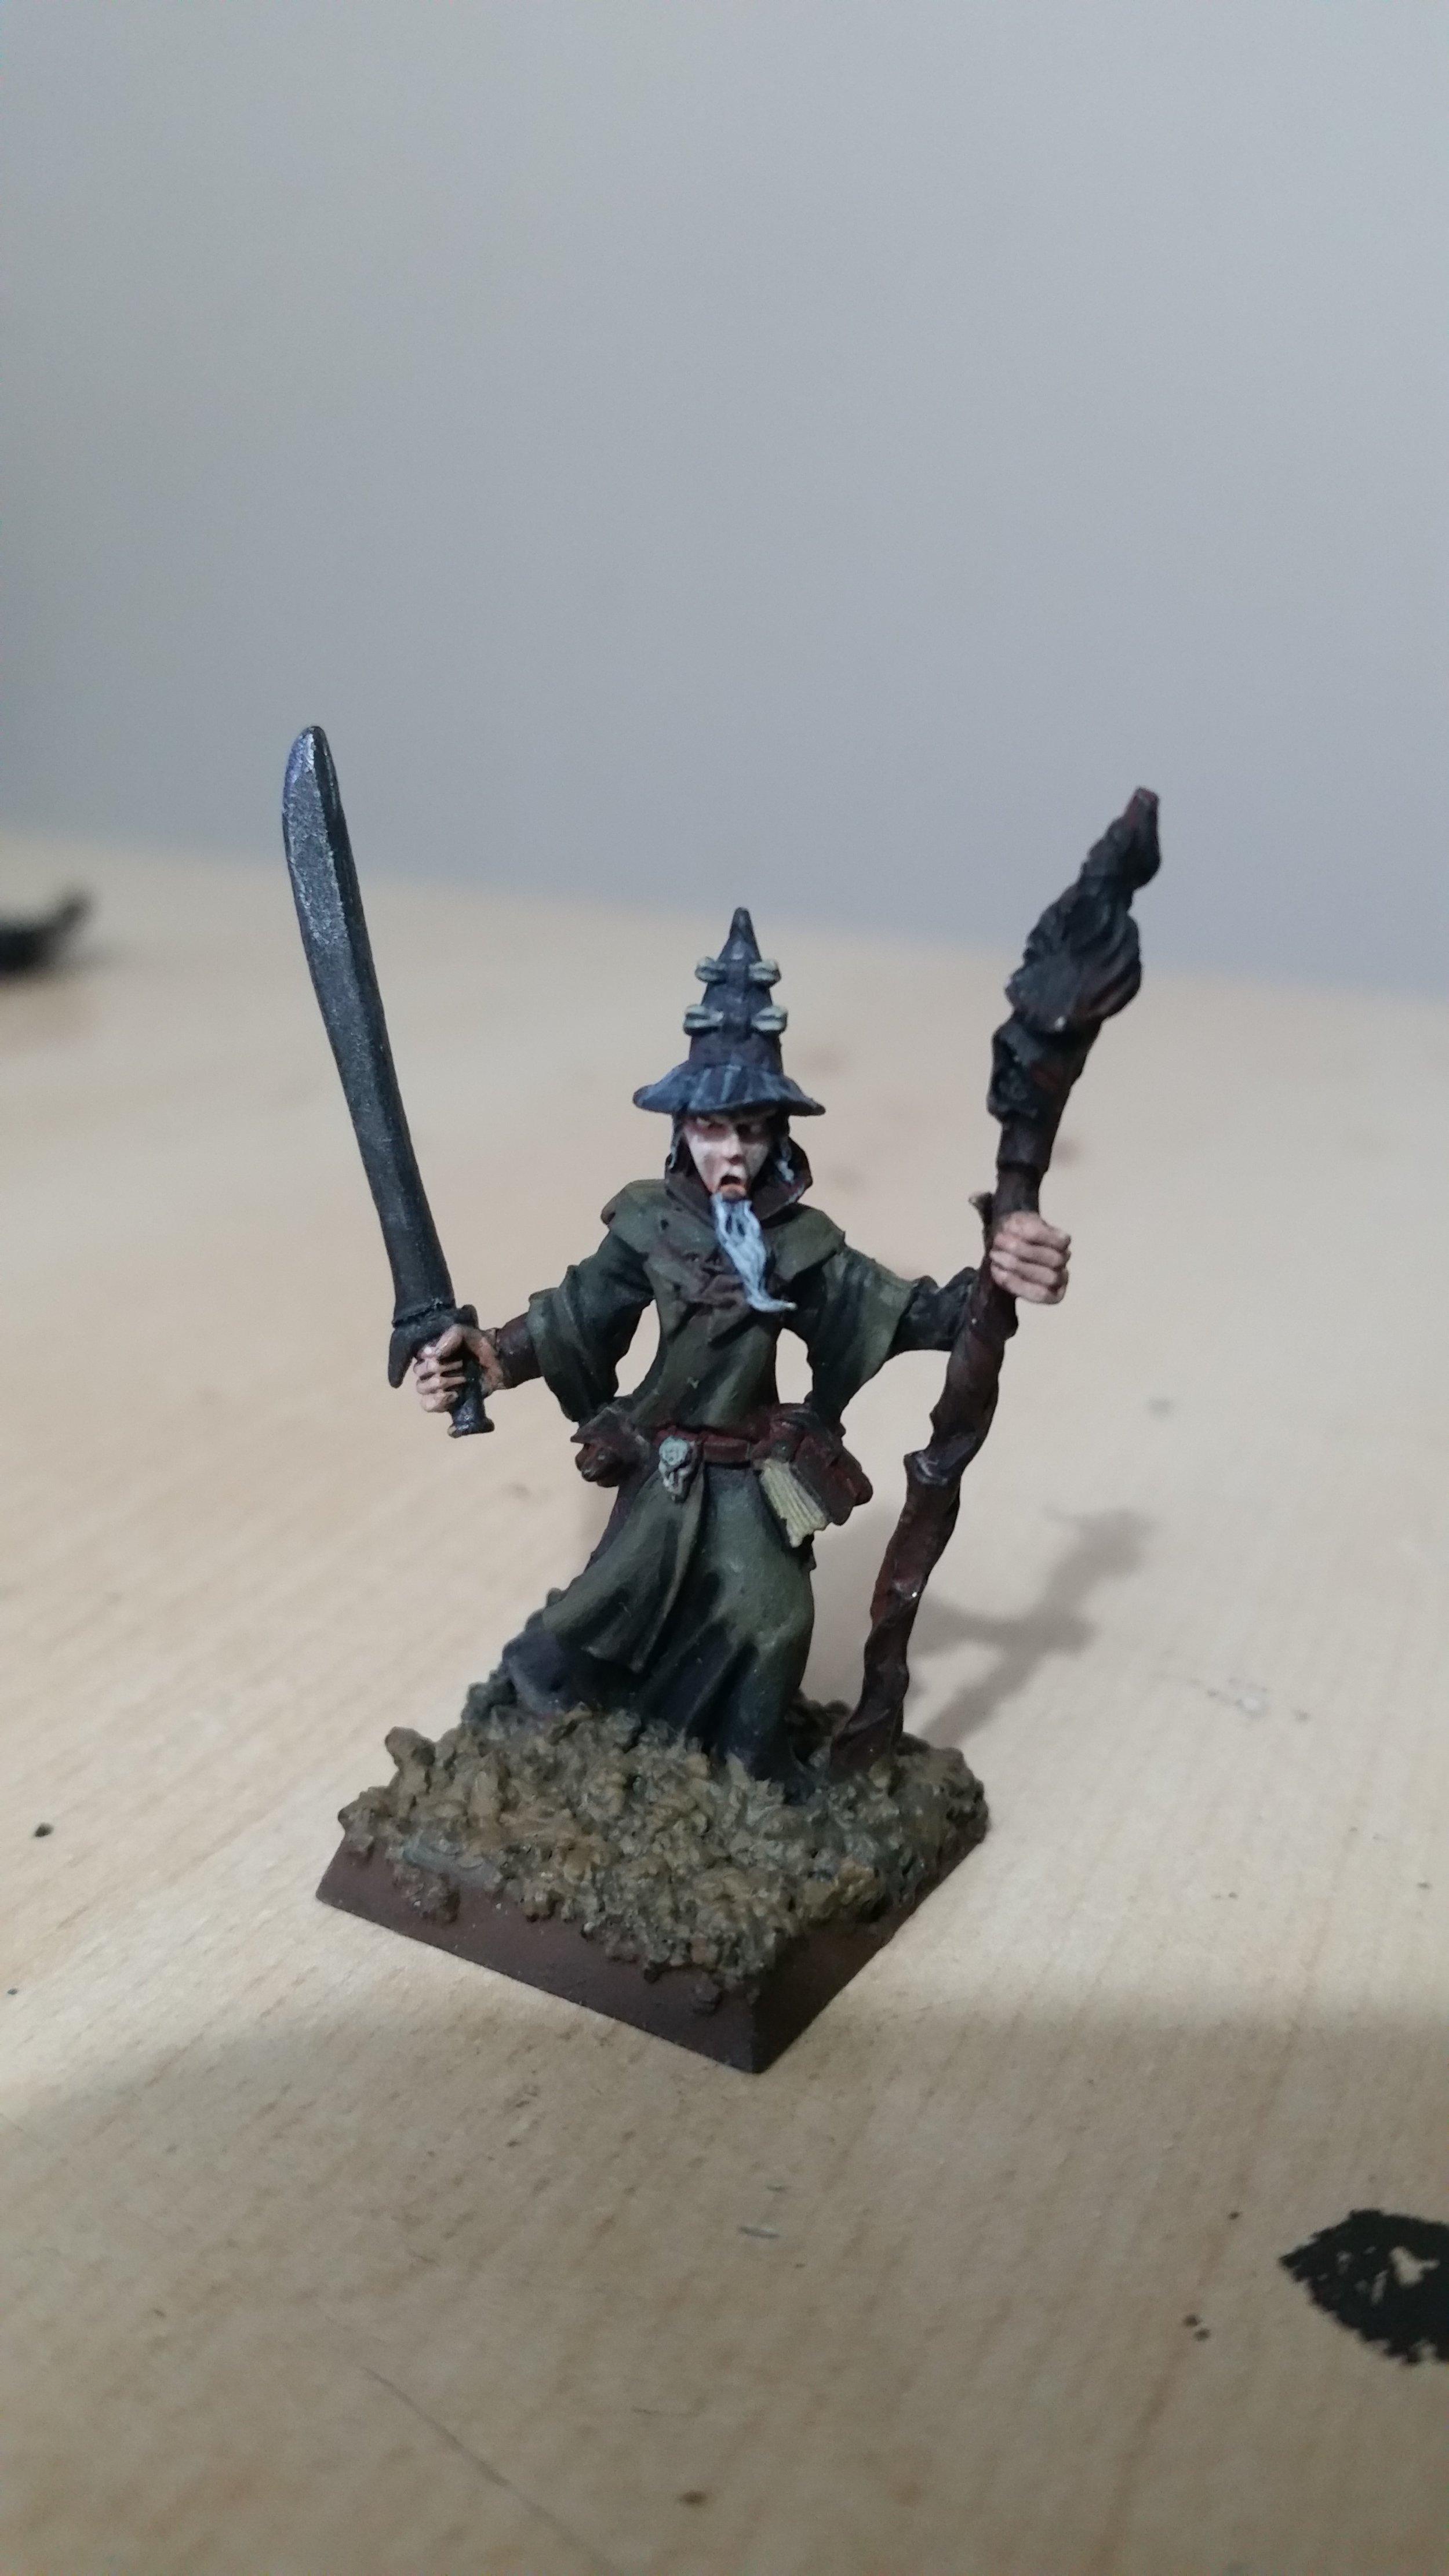 Stormcrow the Thaumaturge Apprentice. 200pts